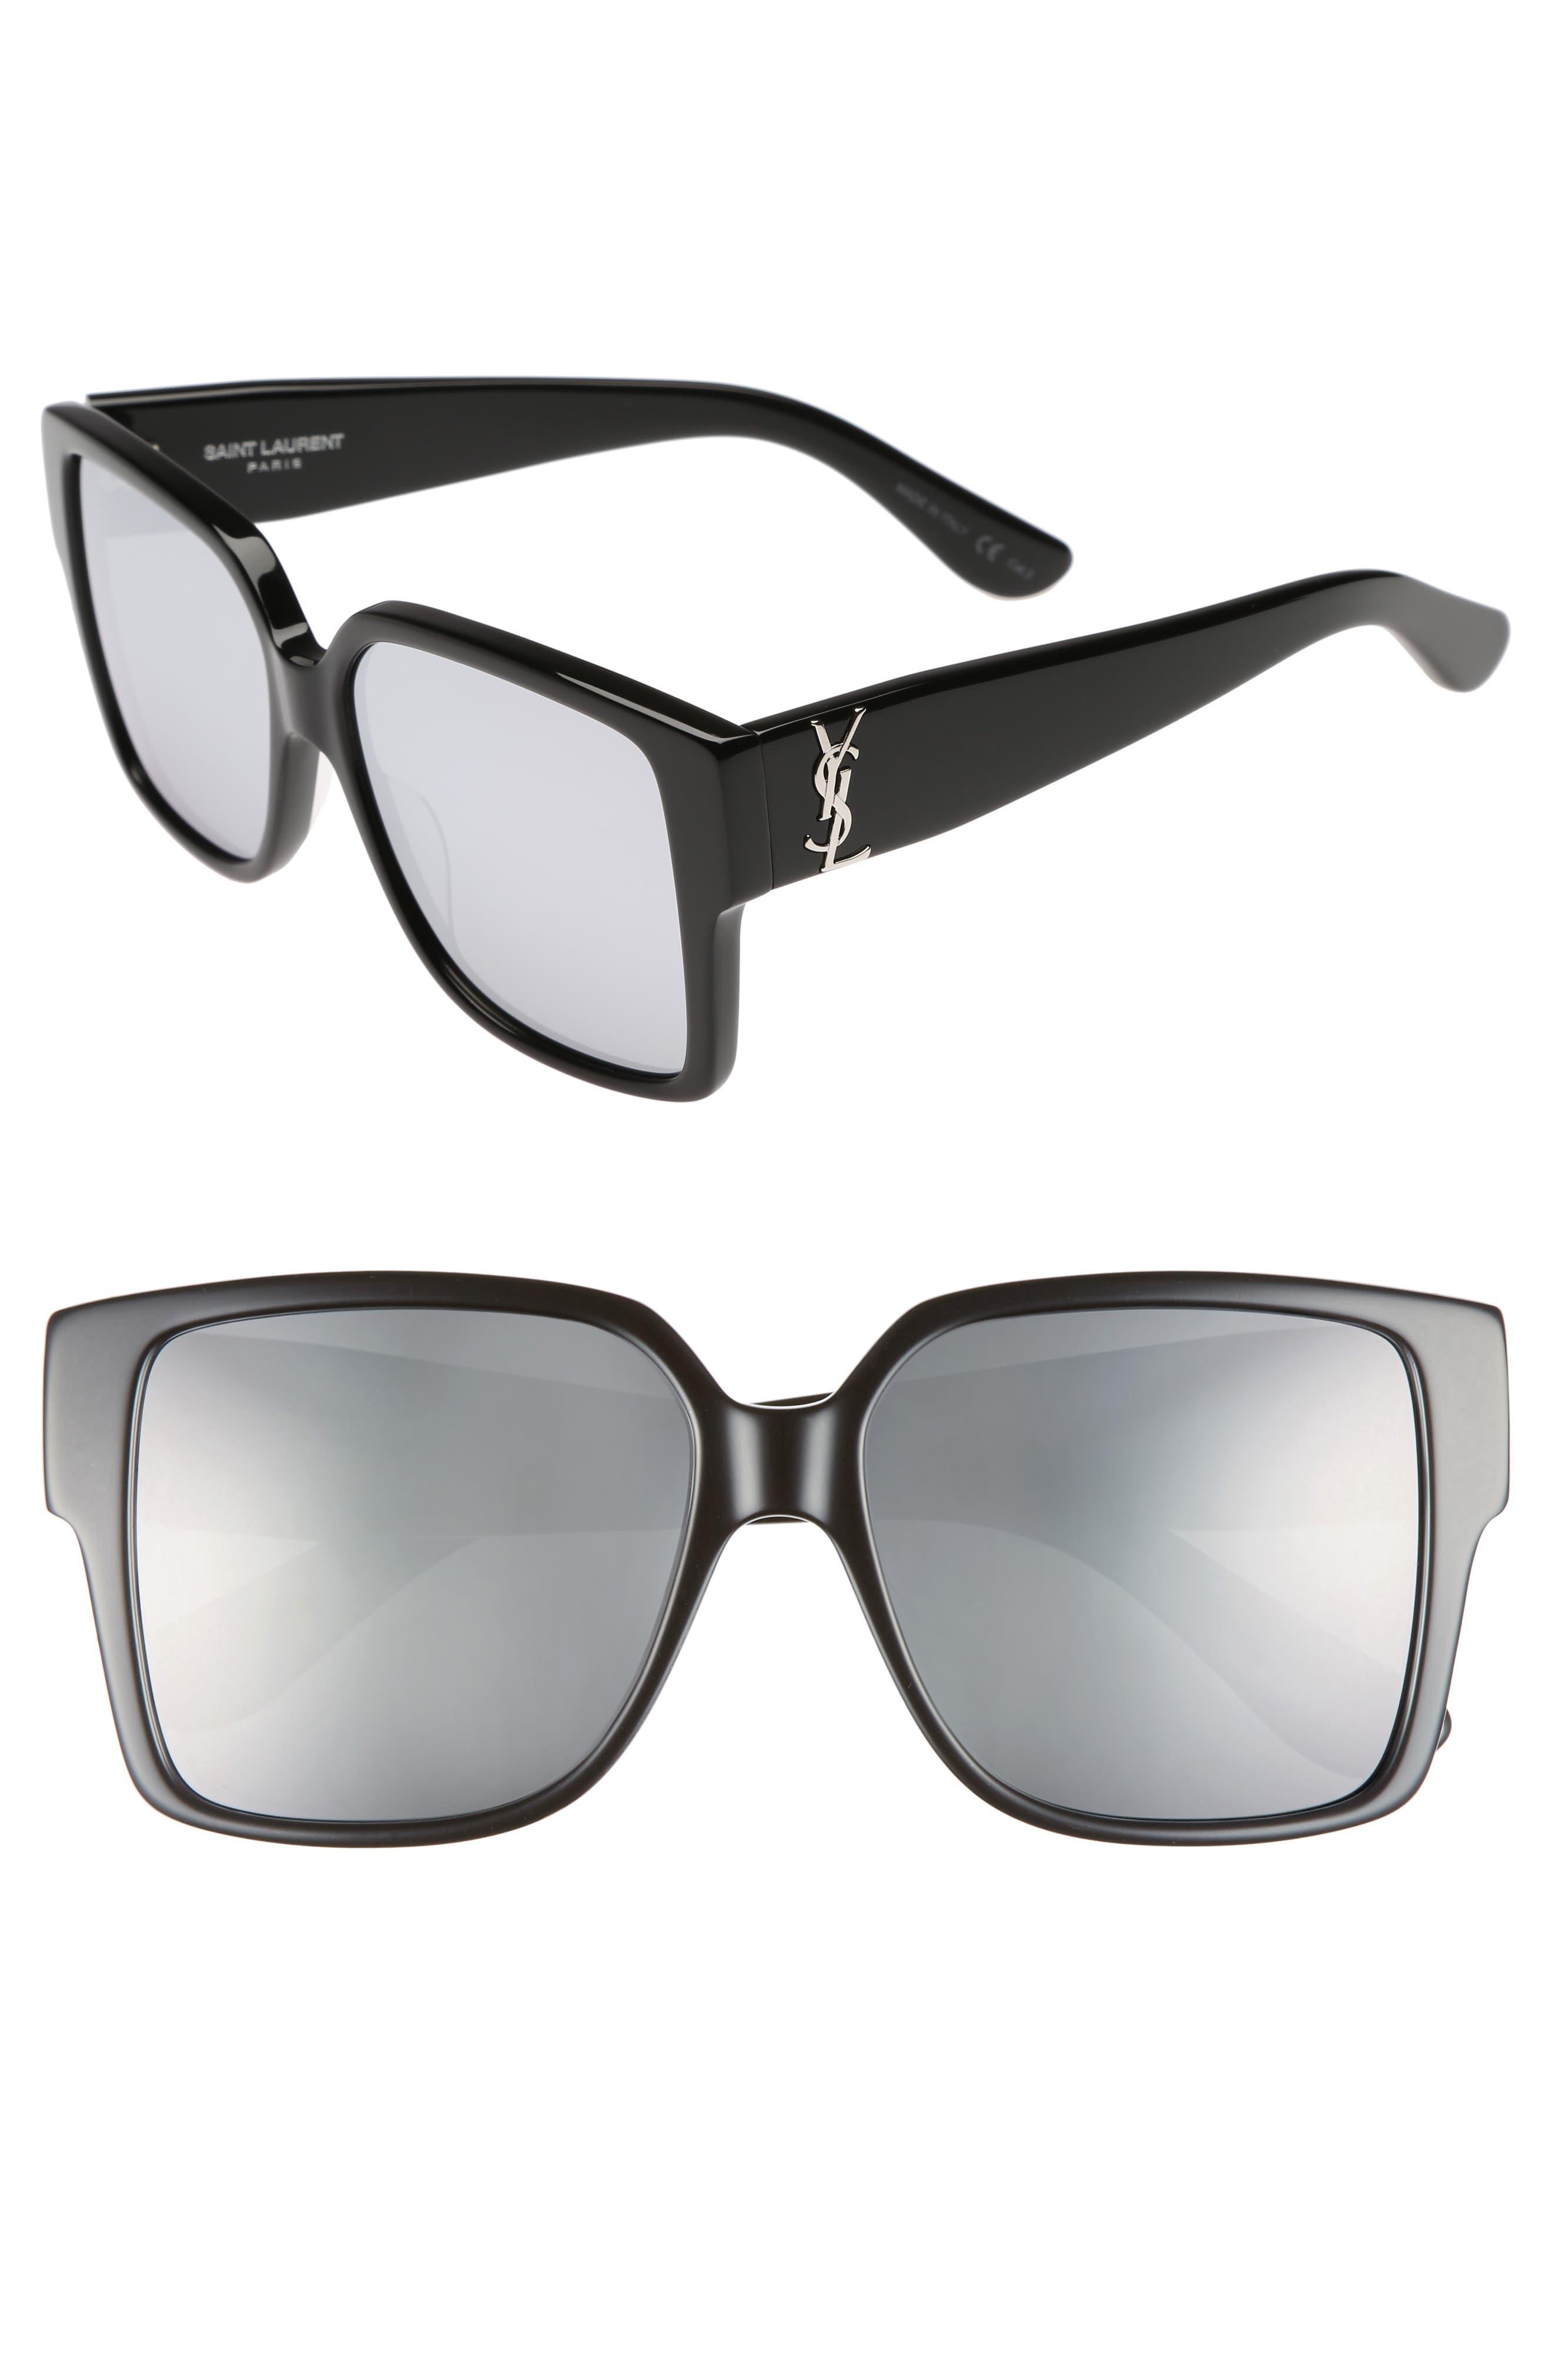 Main Image - Saint Laurent 55mm Square Sunglasses